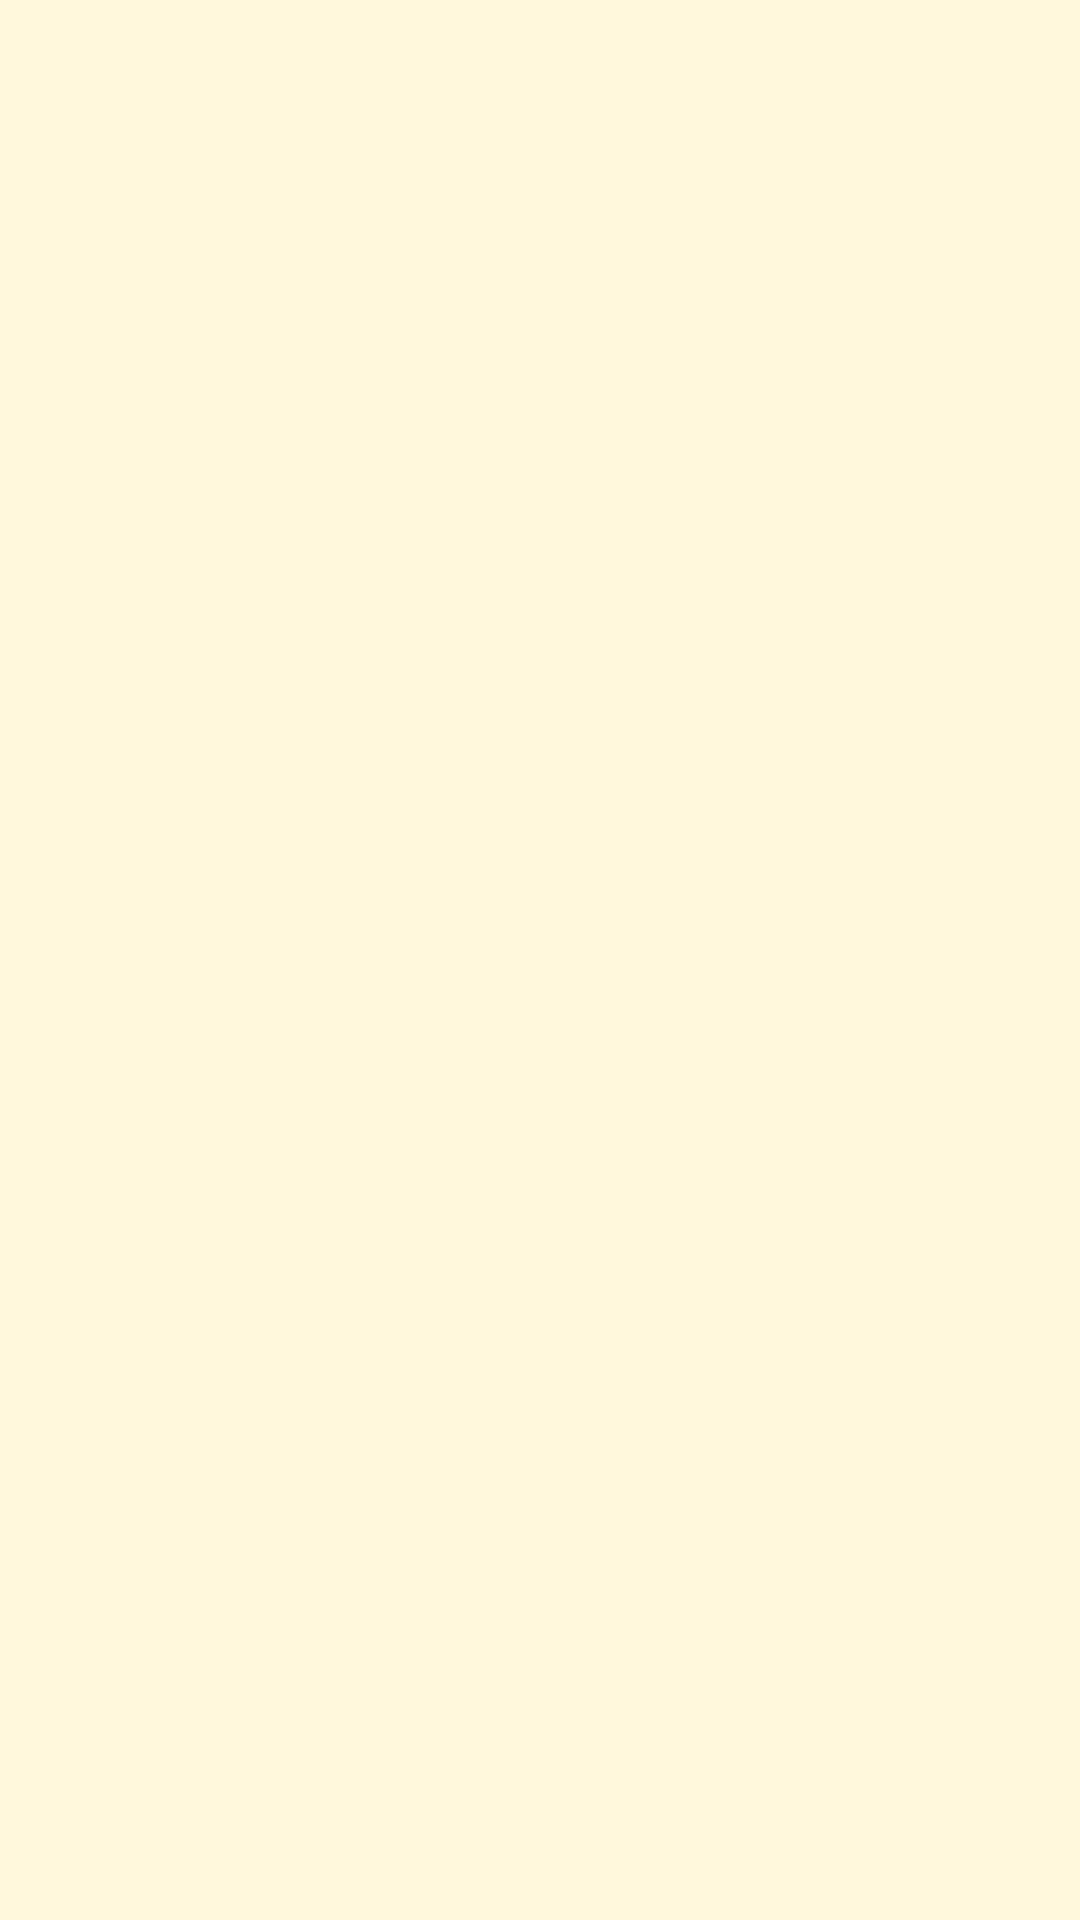 1080x1920 Cornsilk Solid Color Background